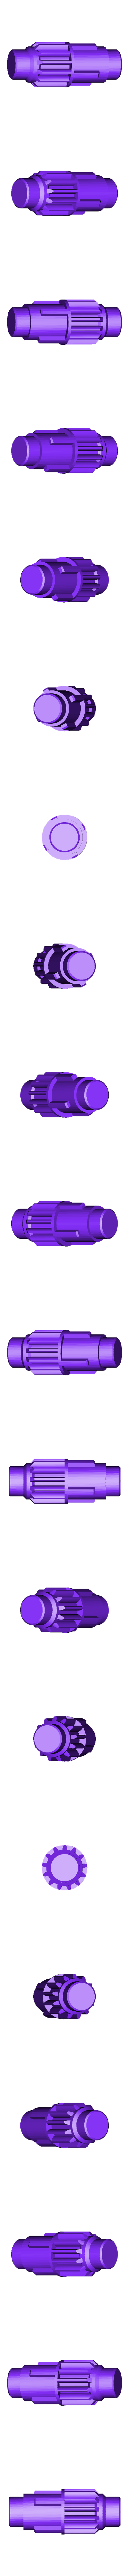 TruckV3_GearboxV3A_gear2A.STL Download STL file 3D Printed RC Truck V3 • 3D print model, MrCrankyface